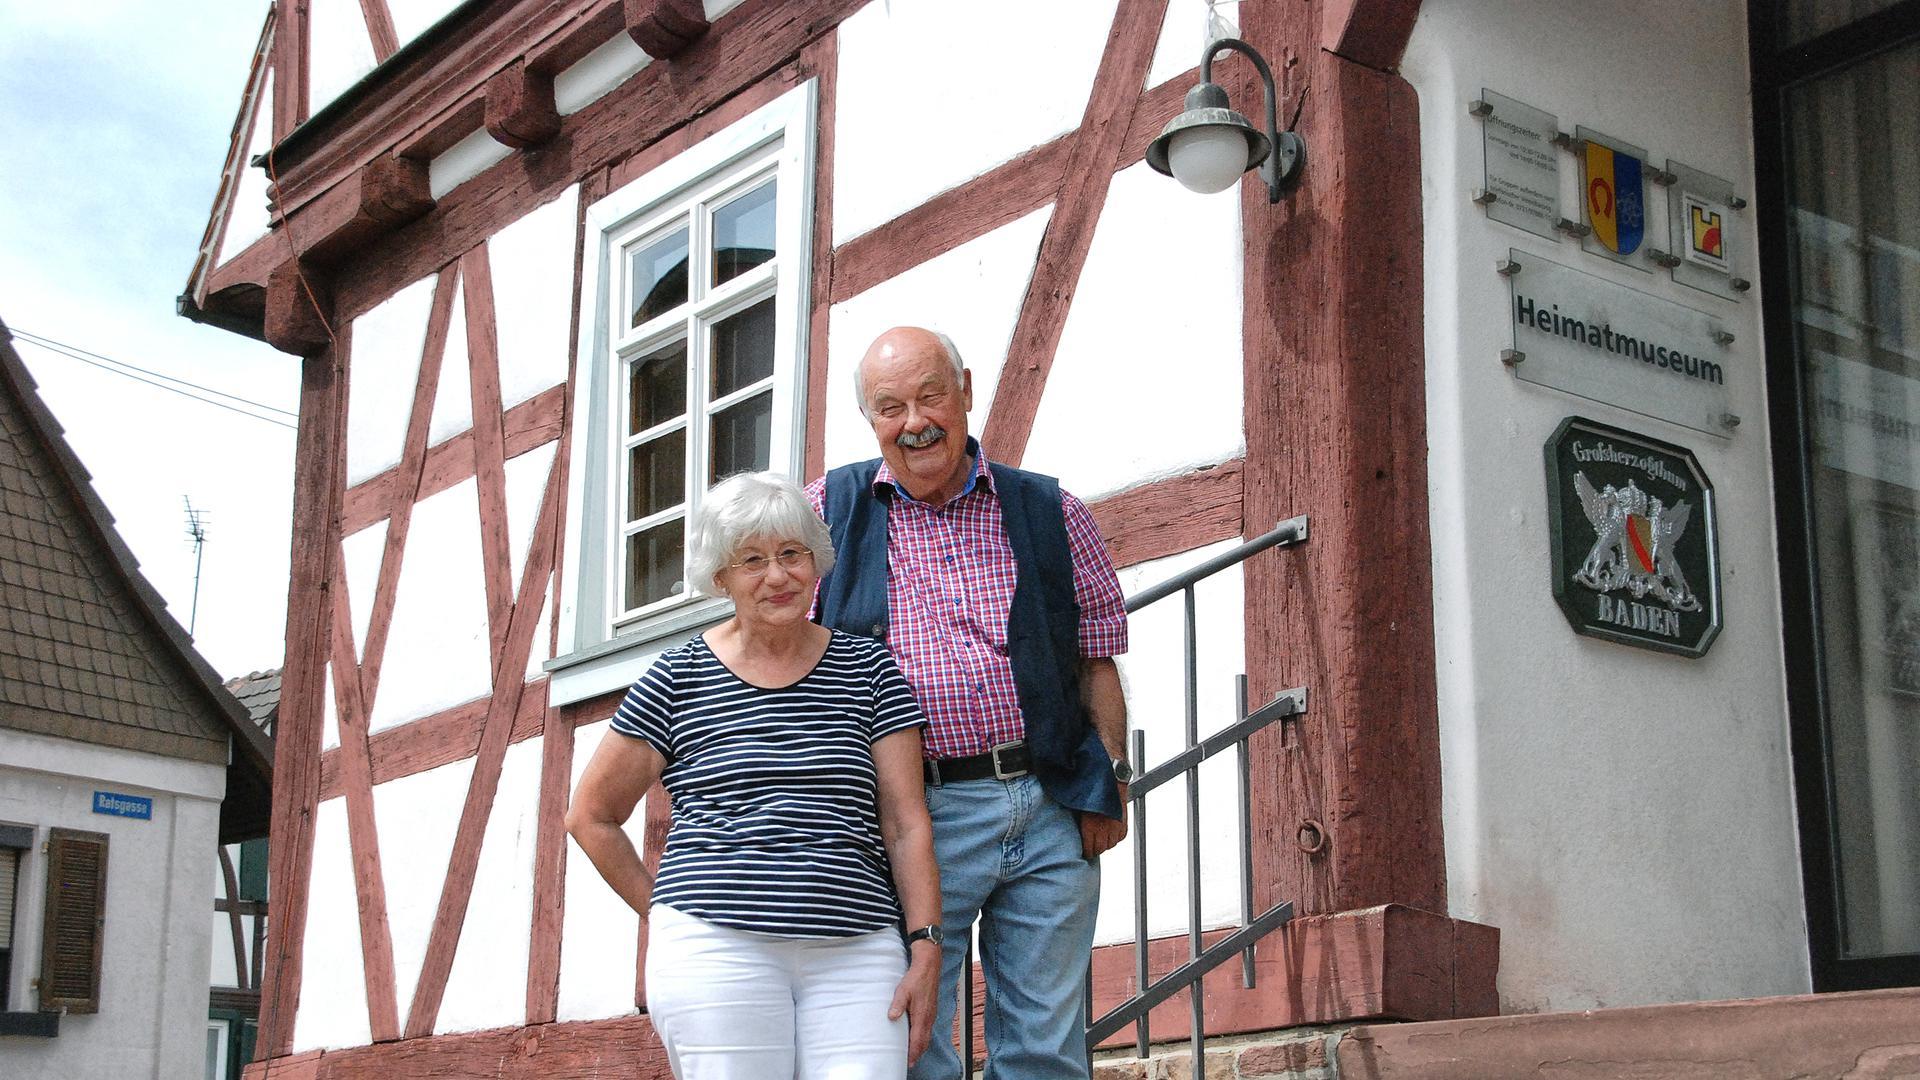 Otti und Wolfgang Knobloch, Heimatmuseum Egg-Leop.